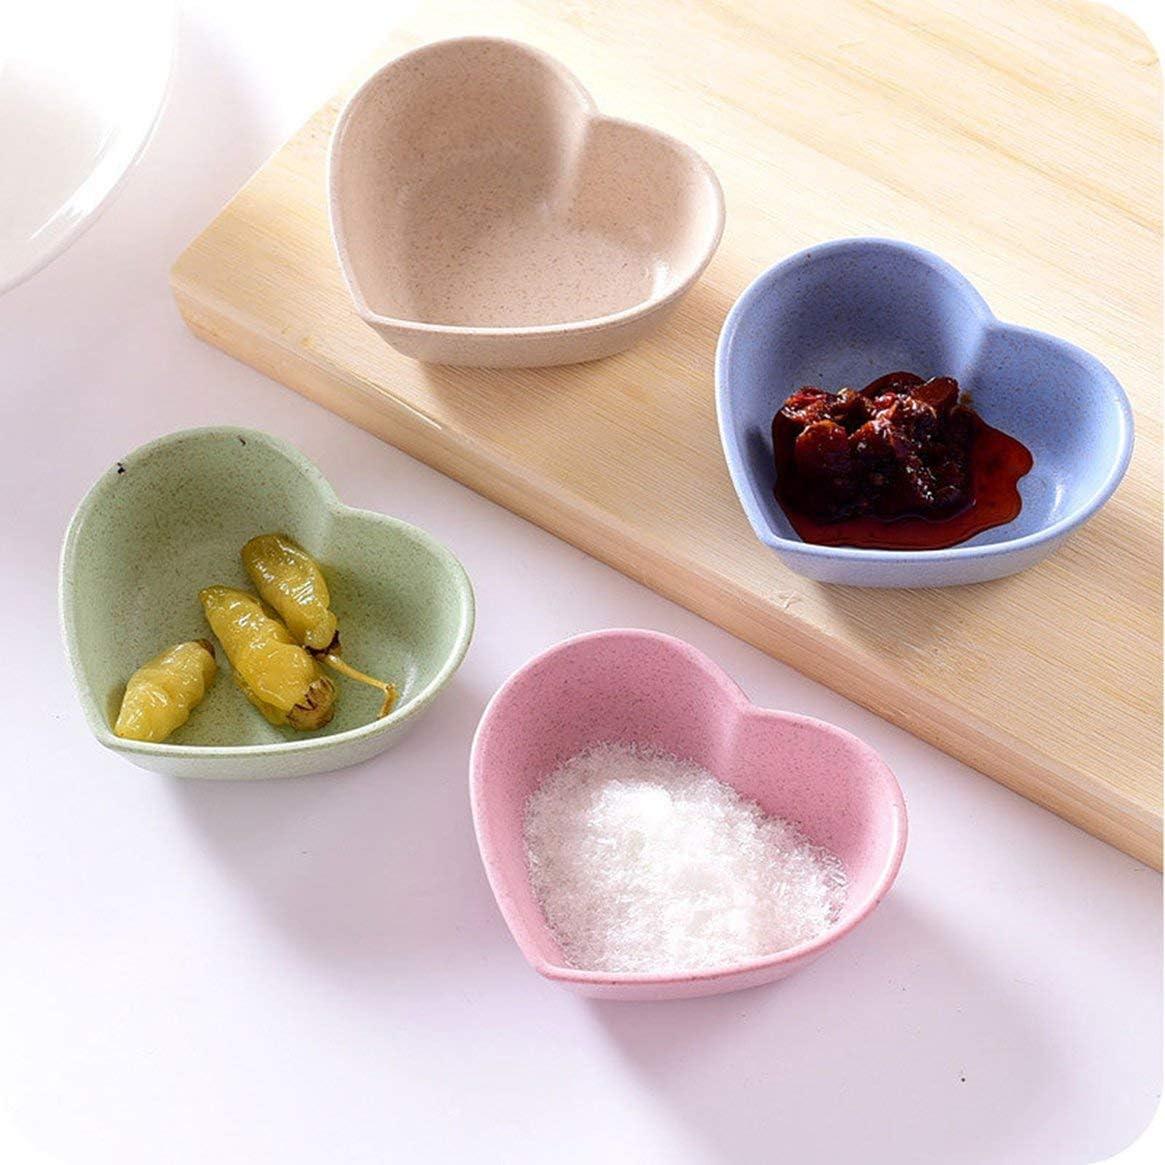 Home Kitchen Wheat Straw Seasoning Dish Creative Plastic Round Pickles Small Dish Tableware Sauce Snack Dish Freeday-uk